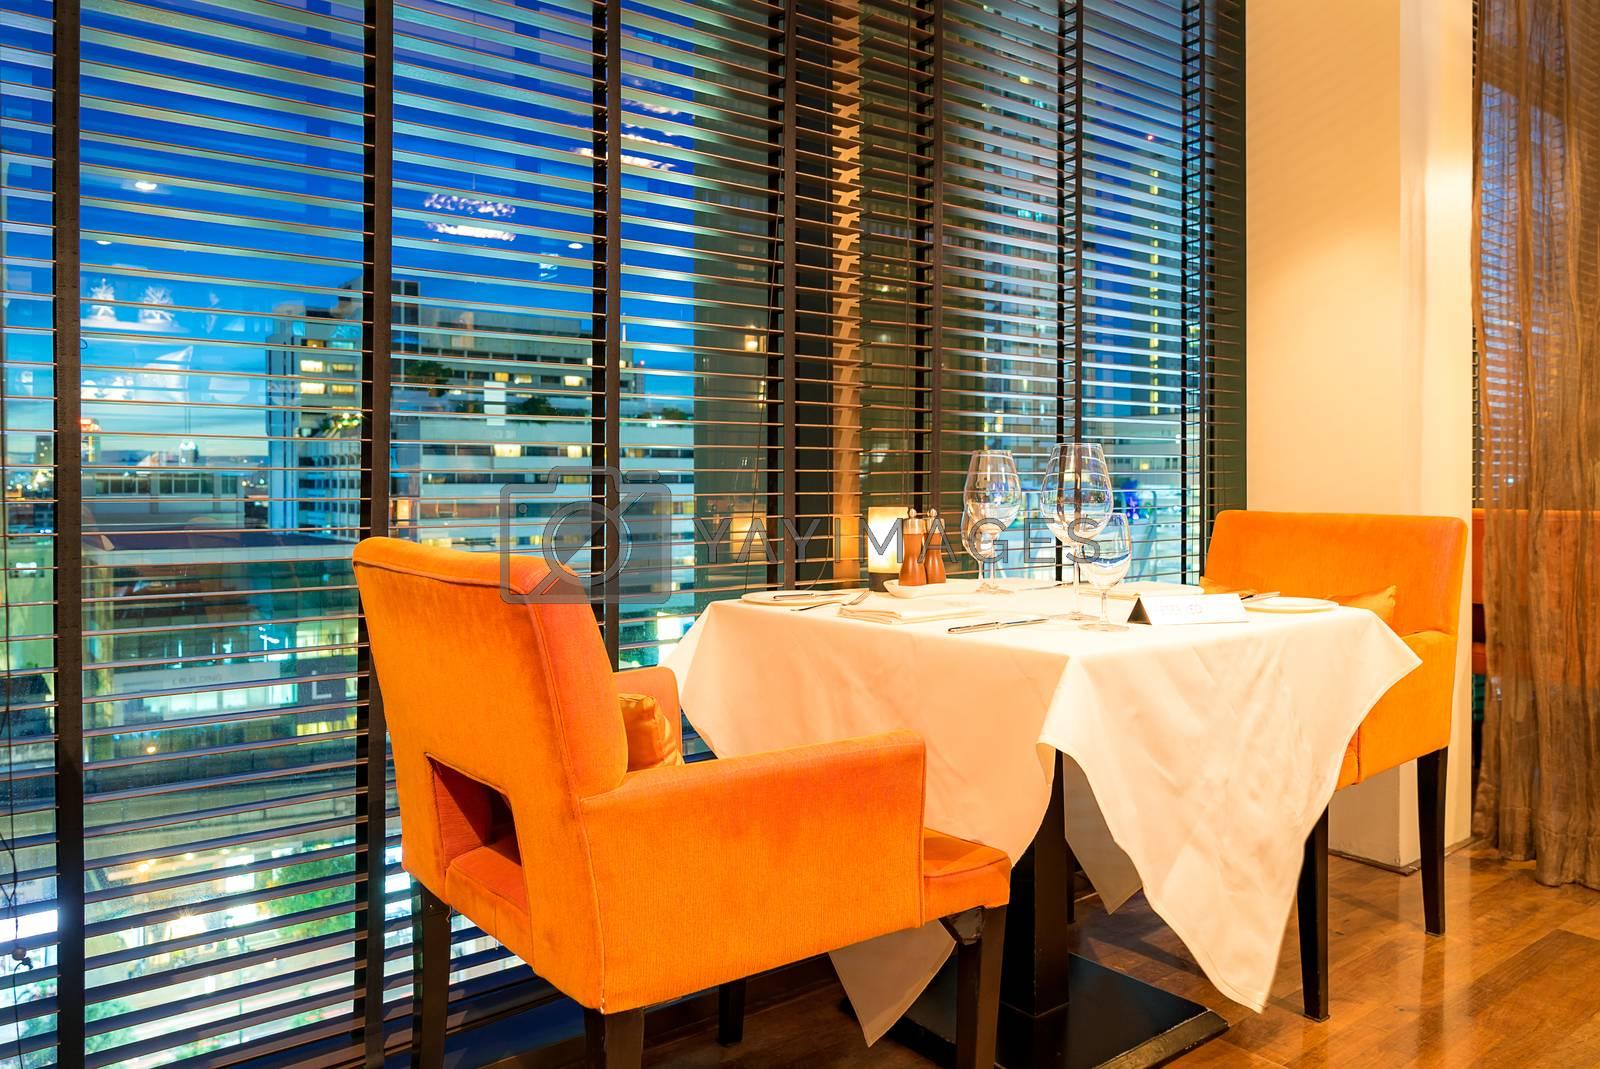 Table Setting interior in Restaurant